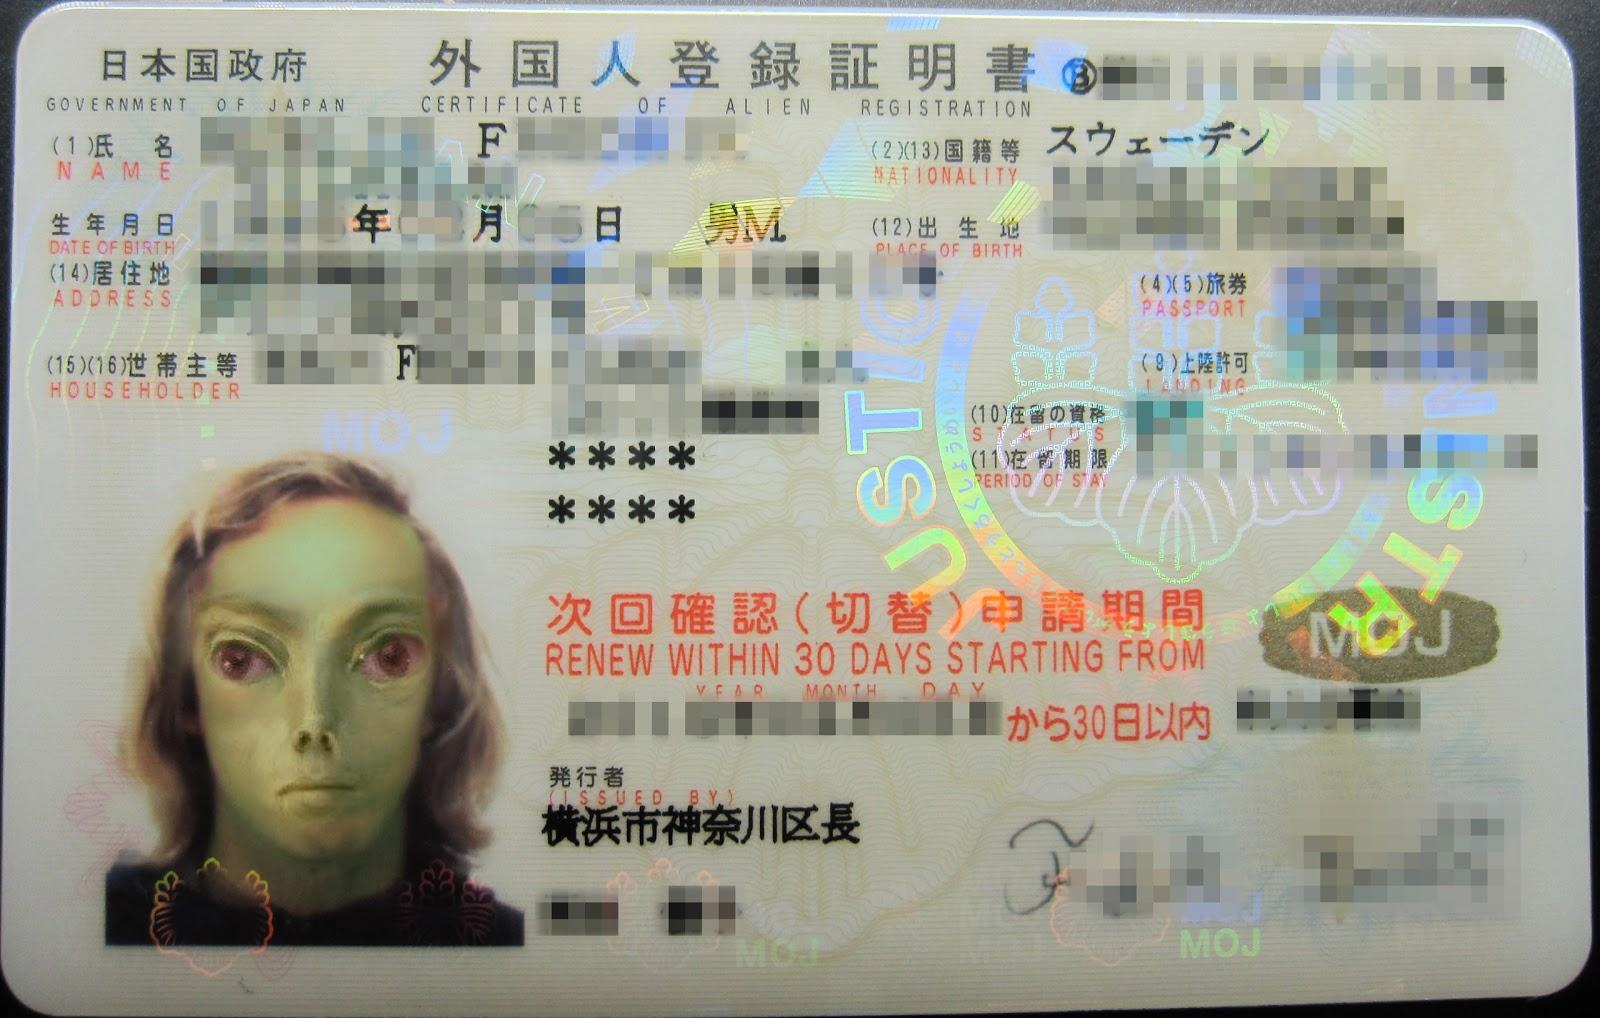 alien registration certificate card legal swedish spy tokyo